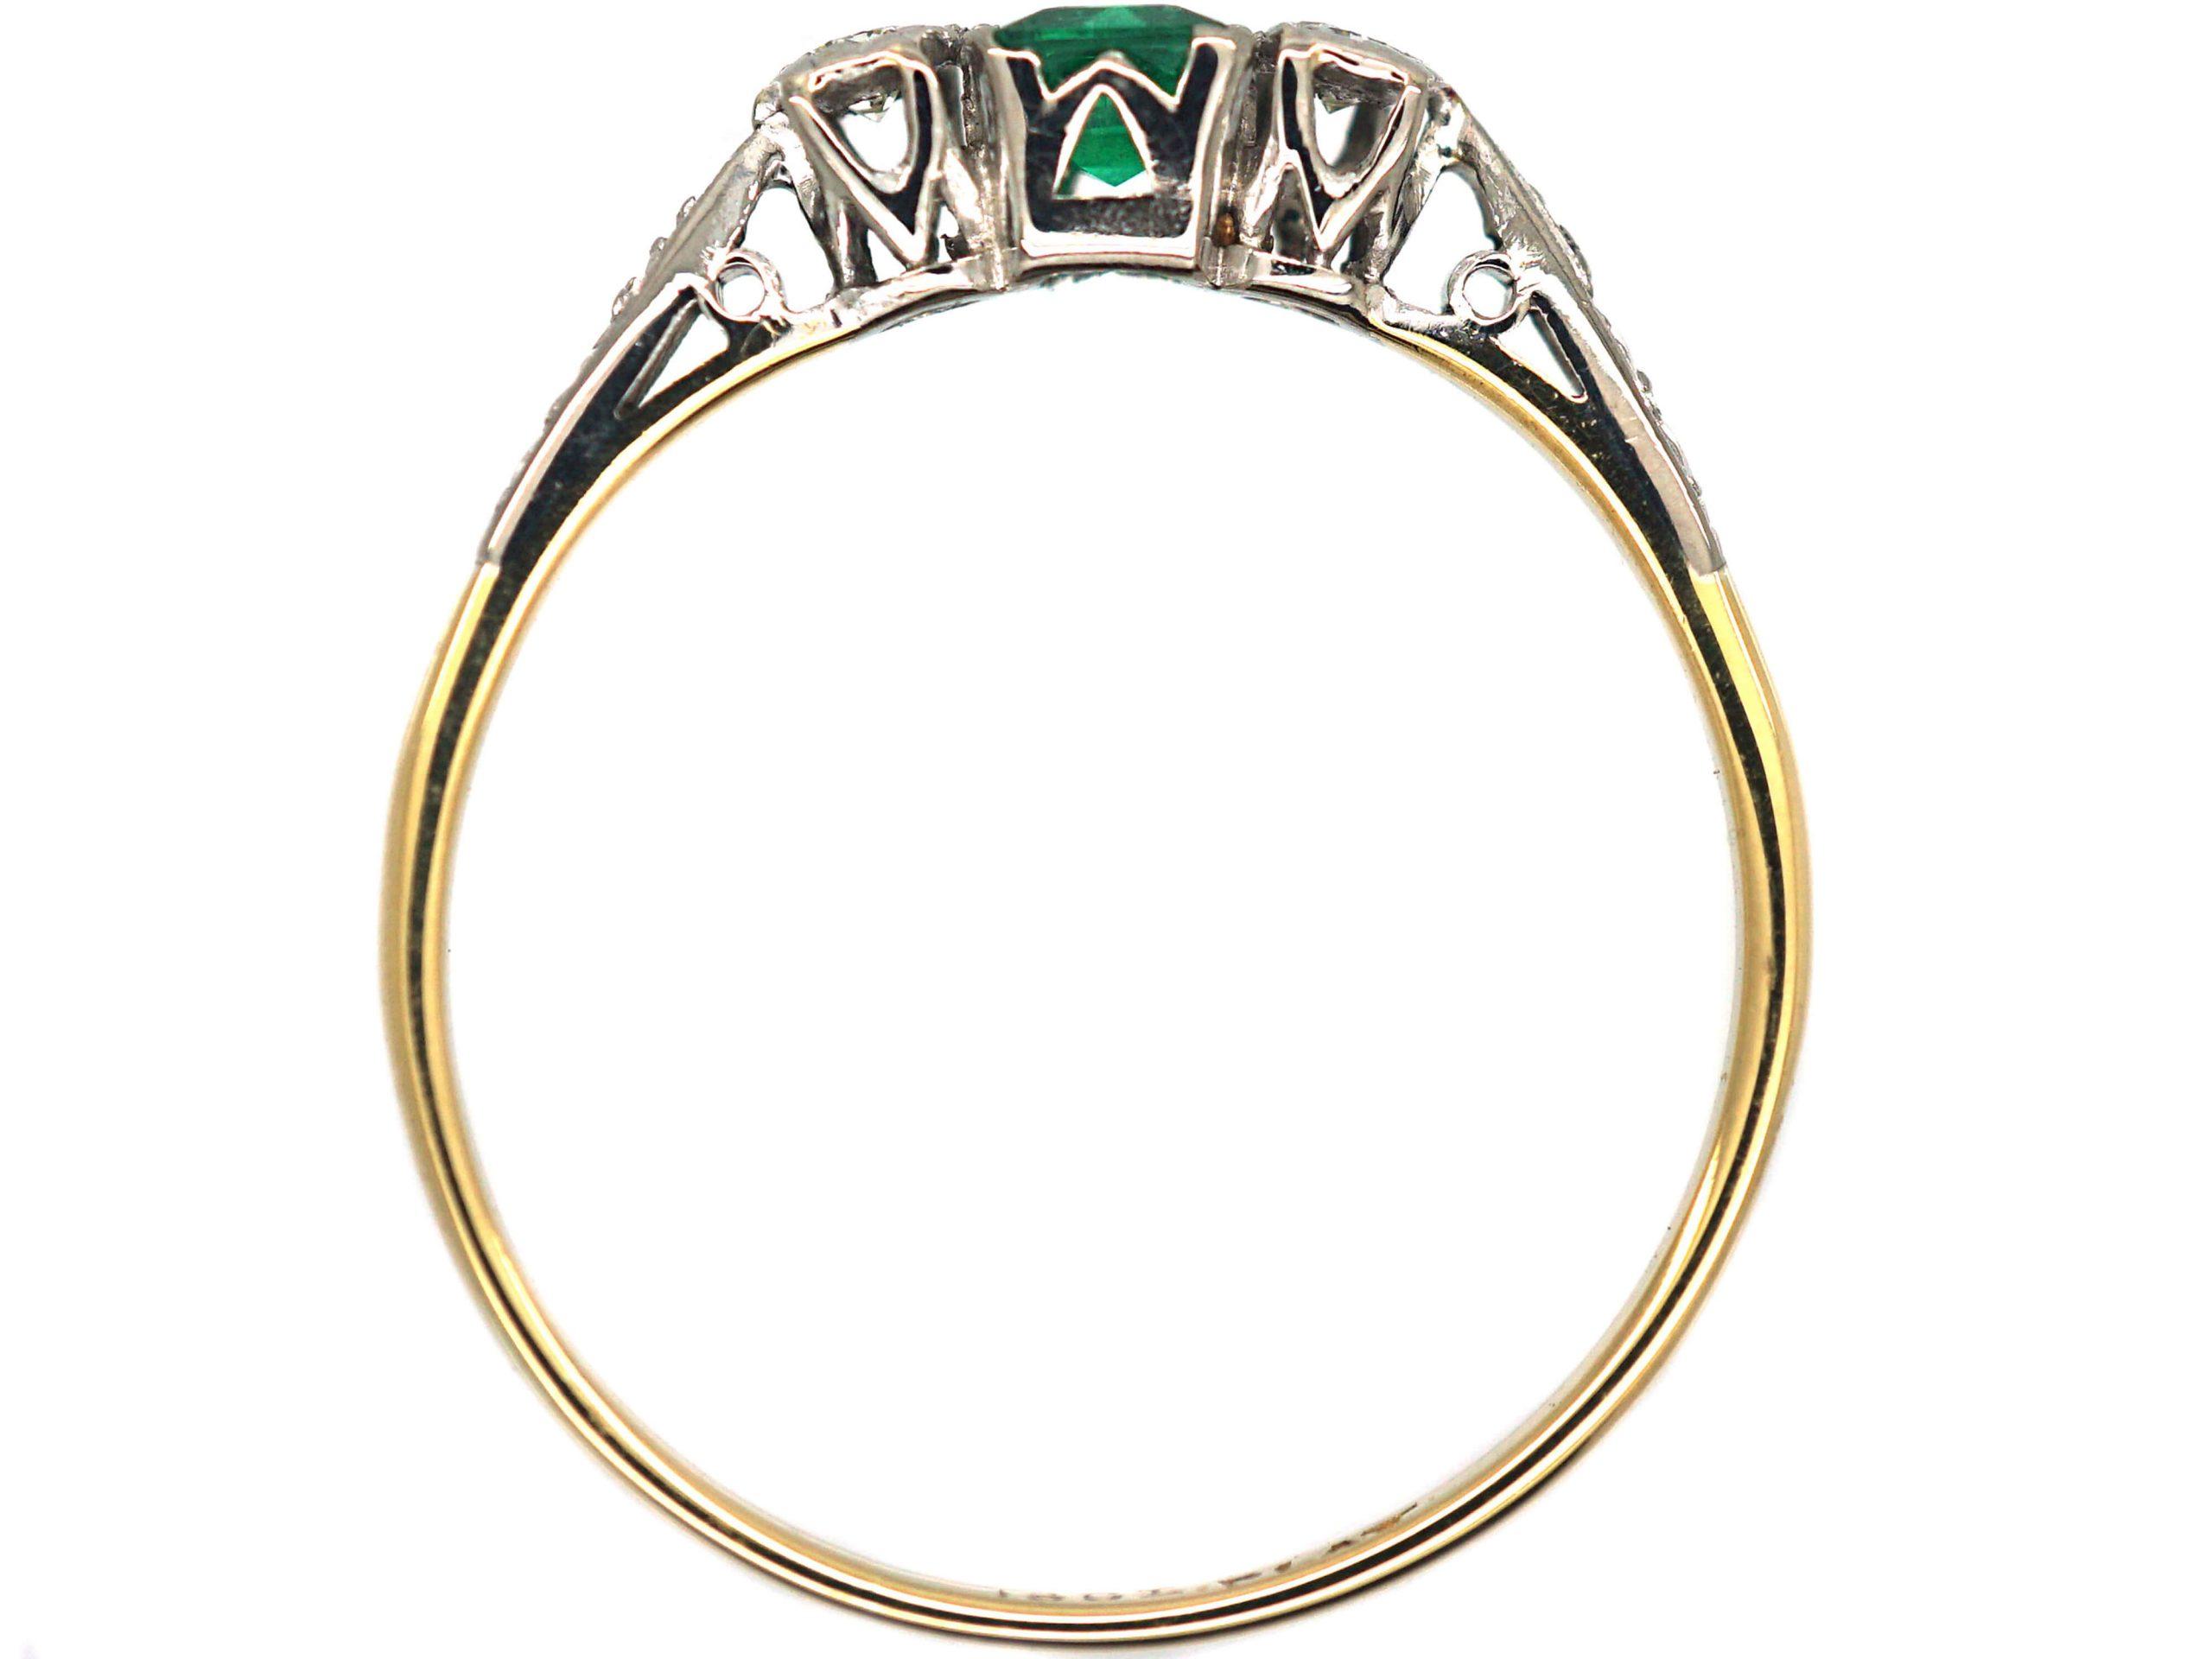 Art Deco 18ct Gold & Platinum, Three Stone Emerald & Diamond Ring